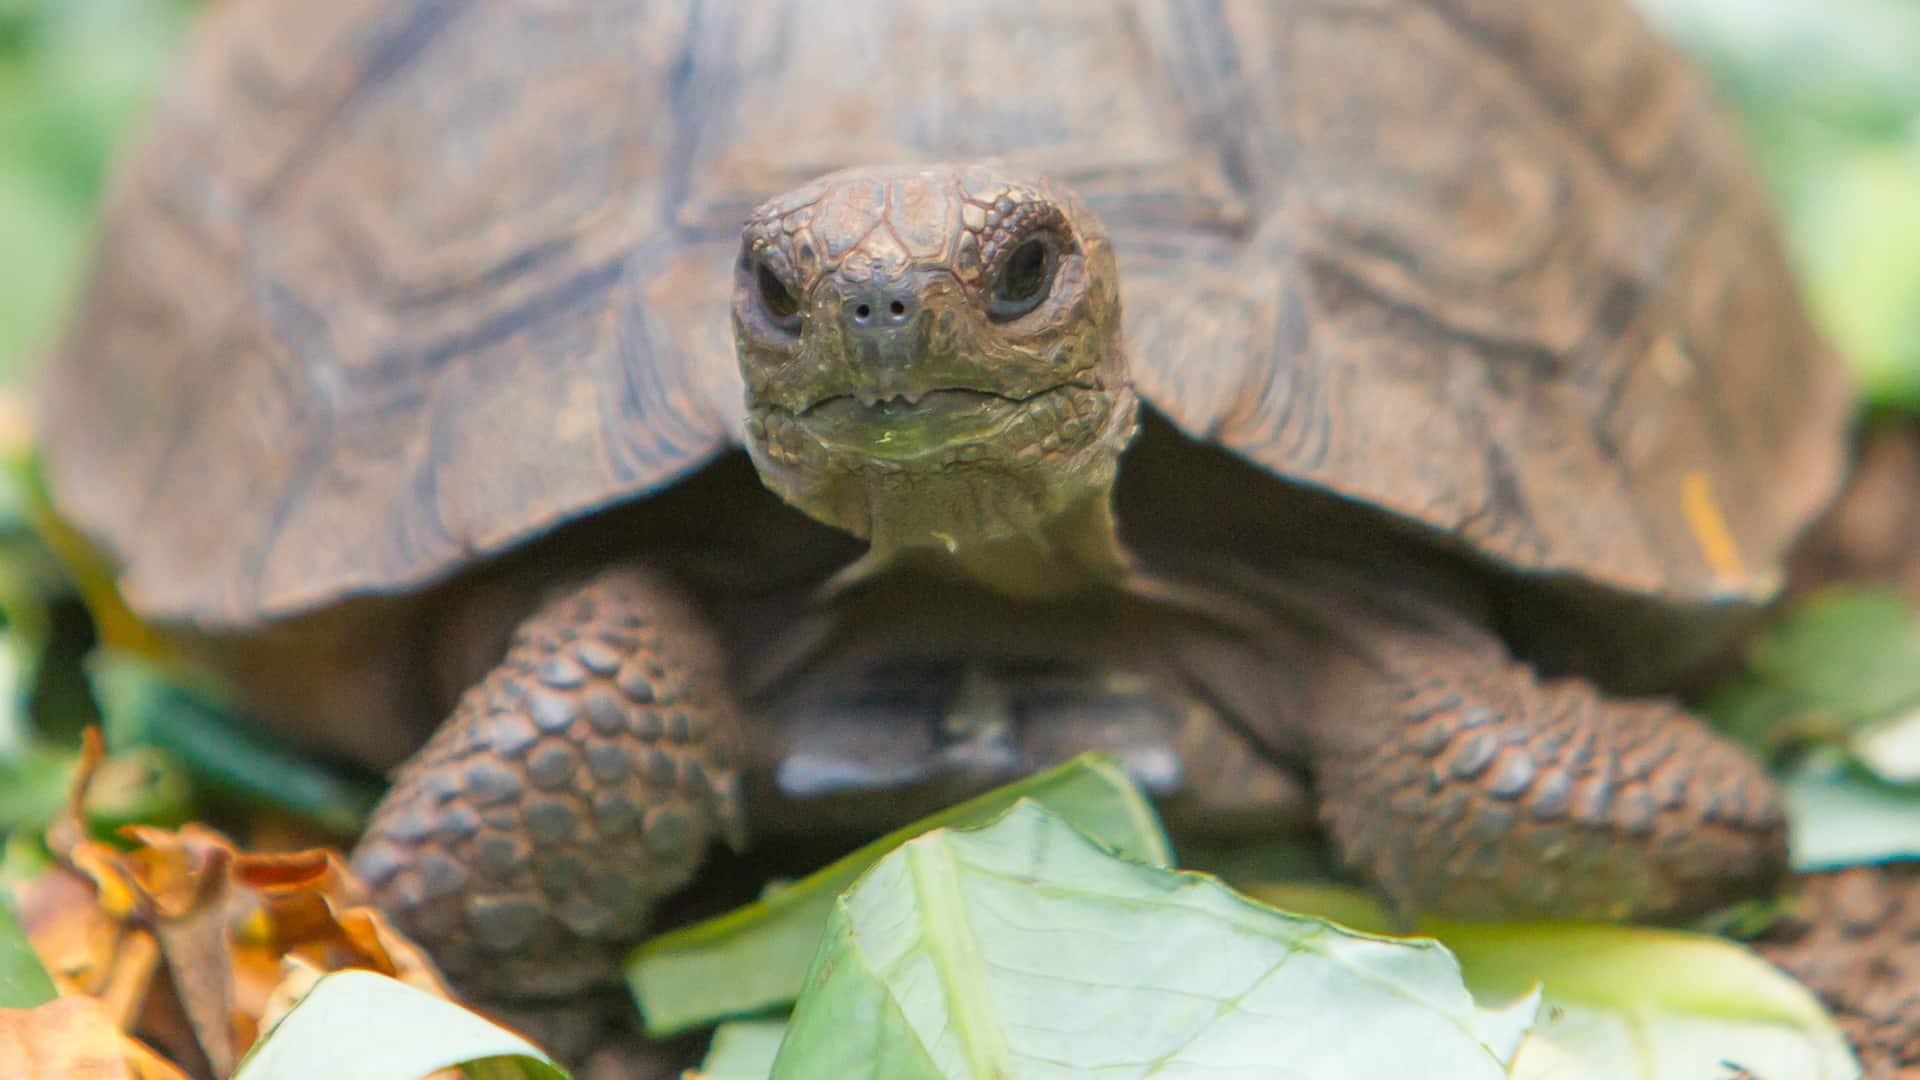 cibo-per-tartarughe-principale-xcyp1